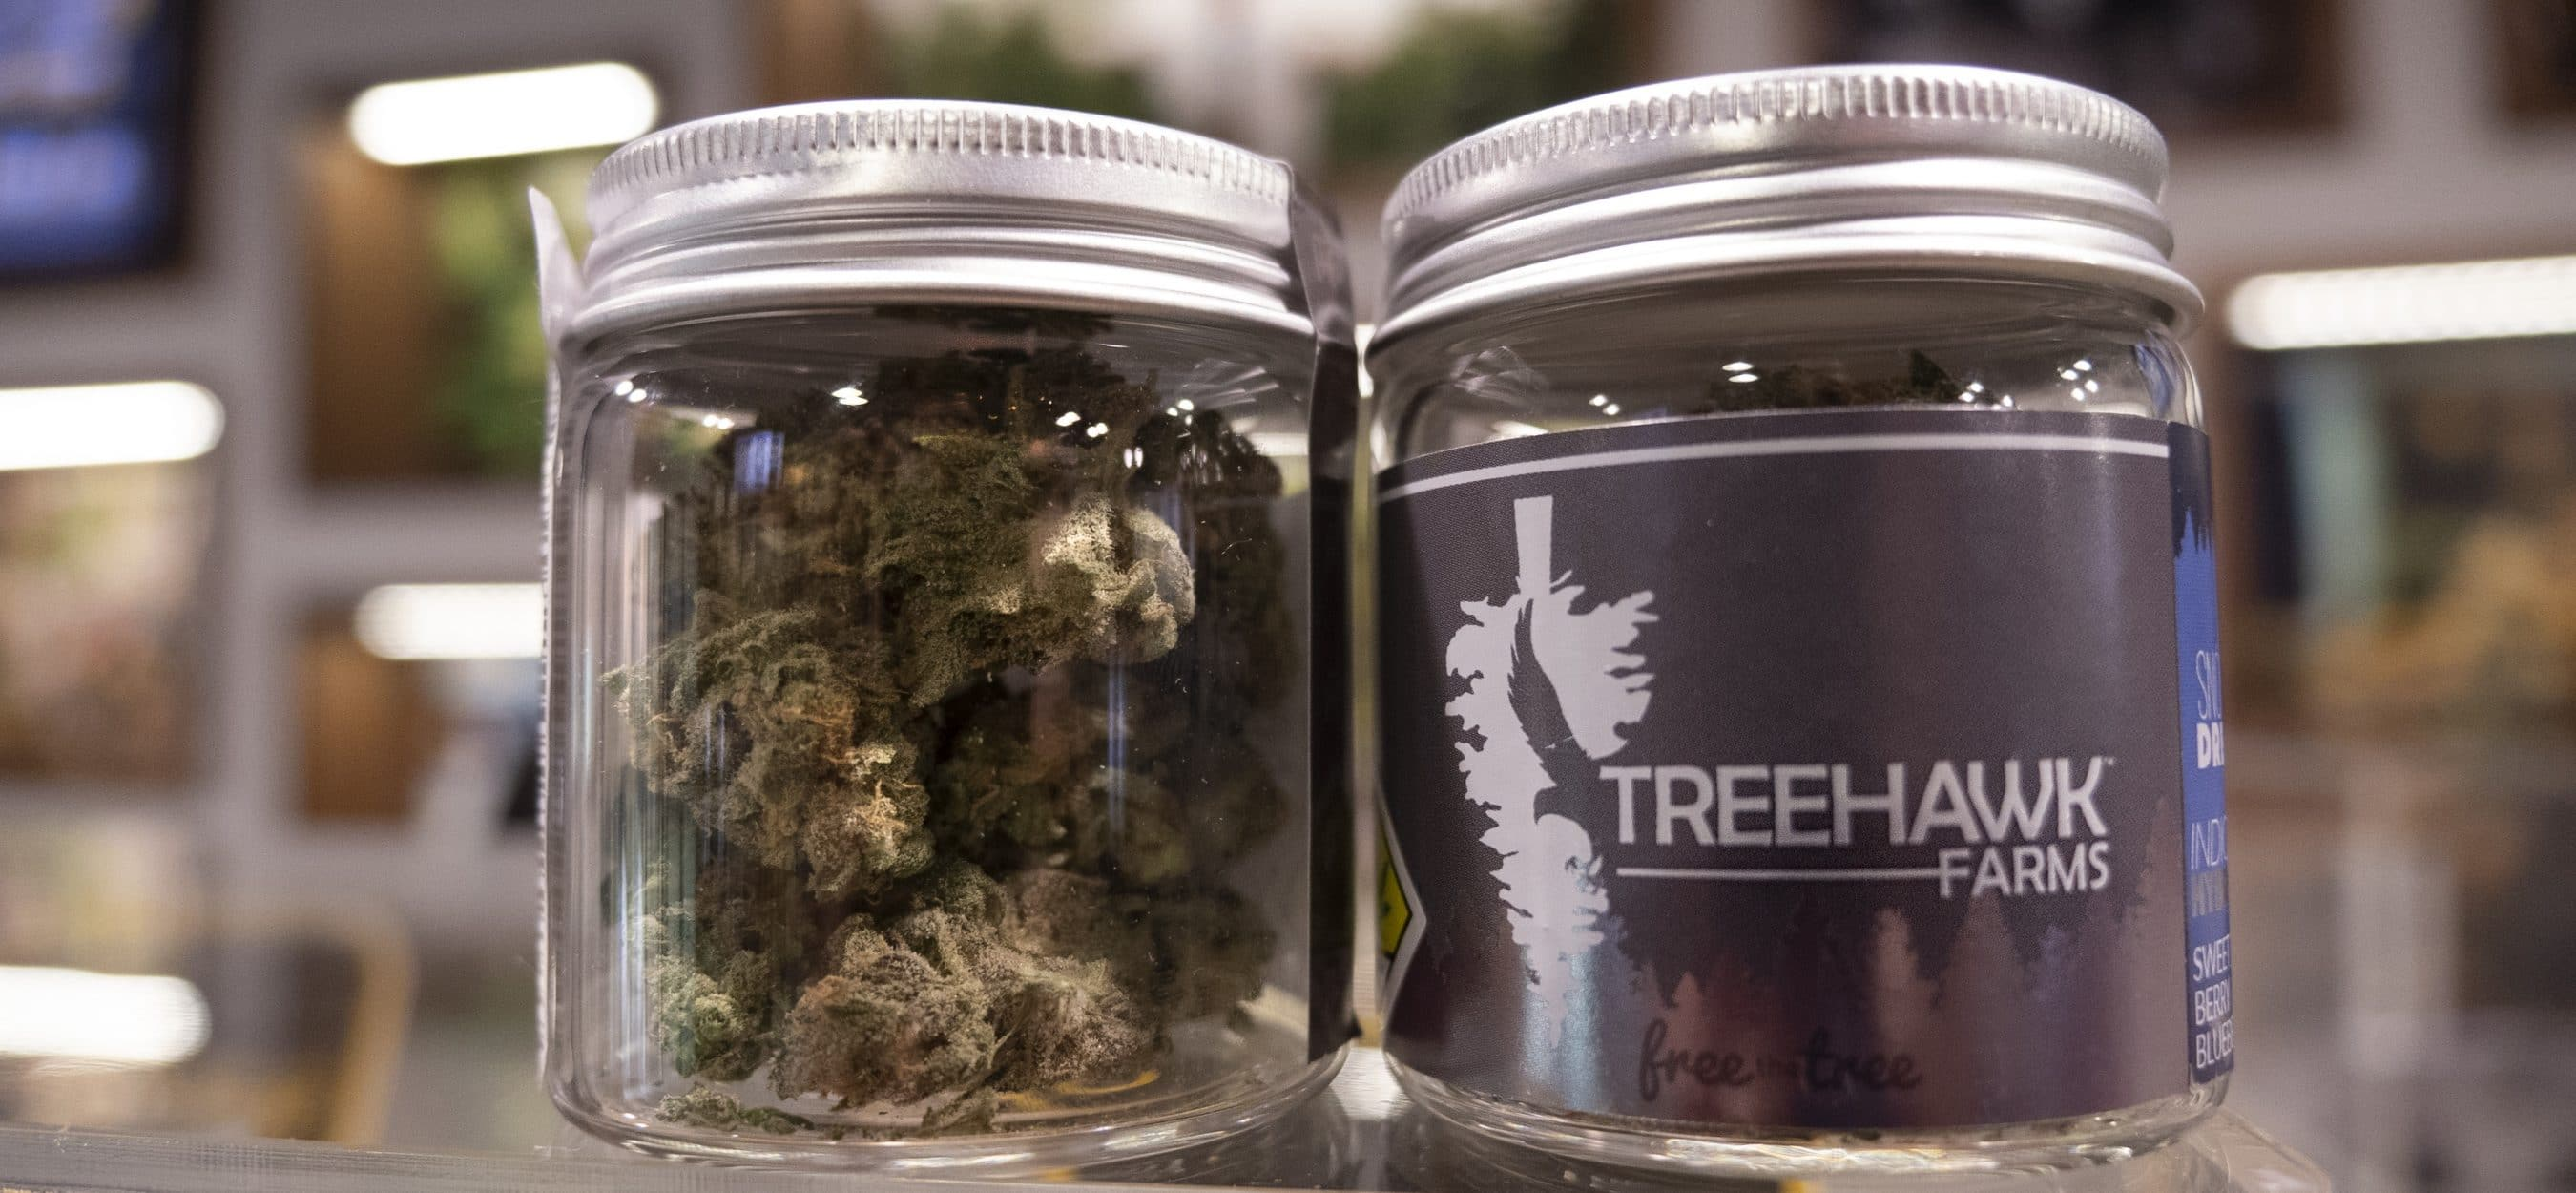 treehawk 7 image